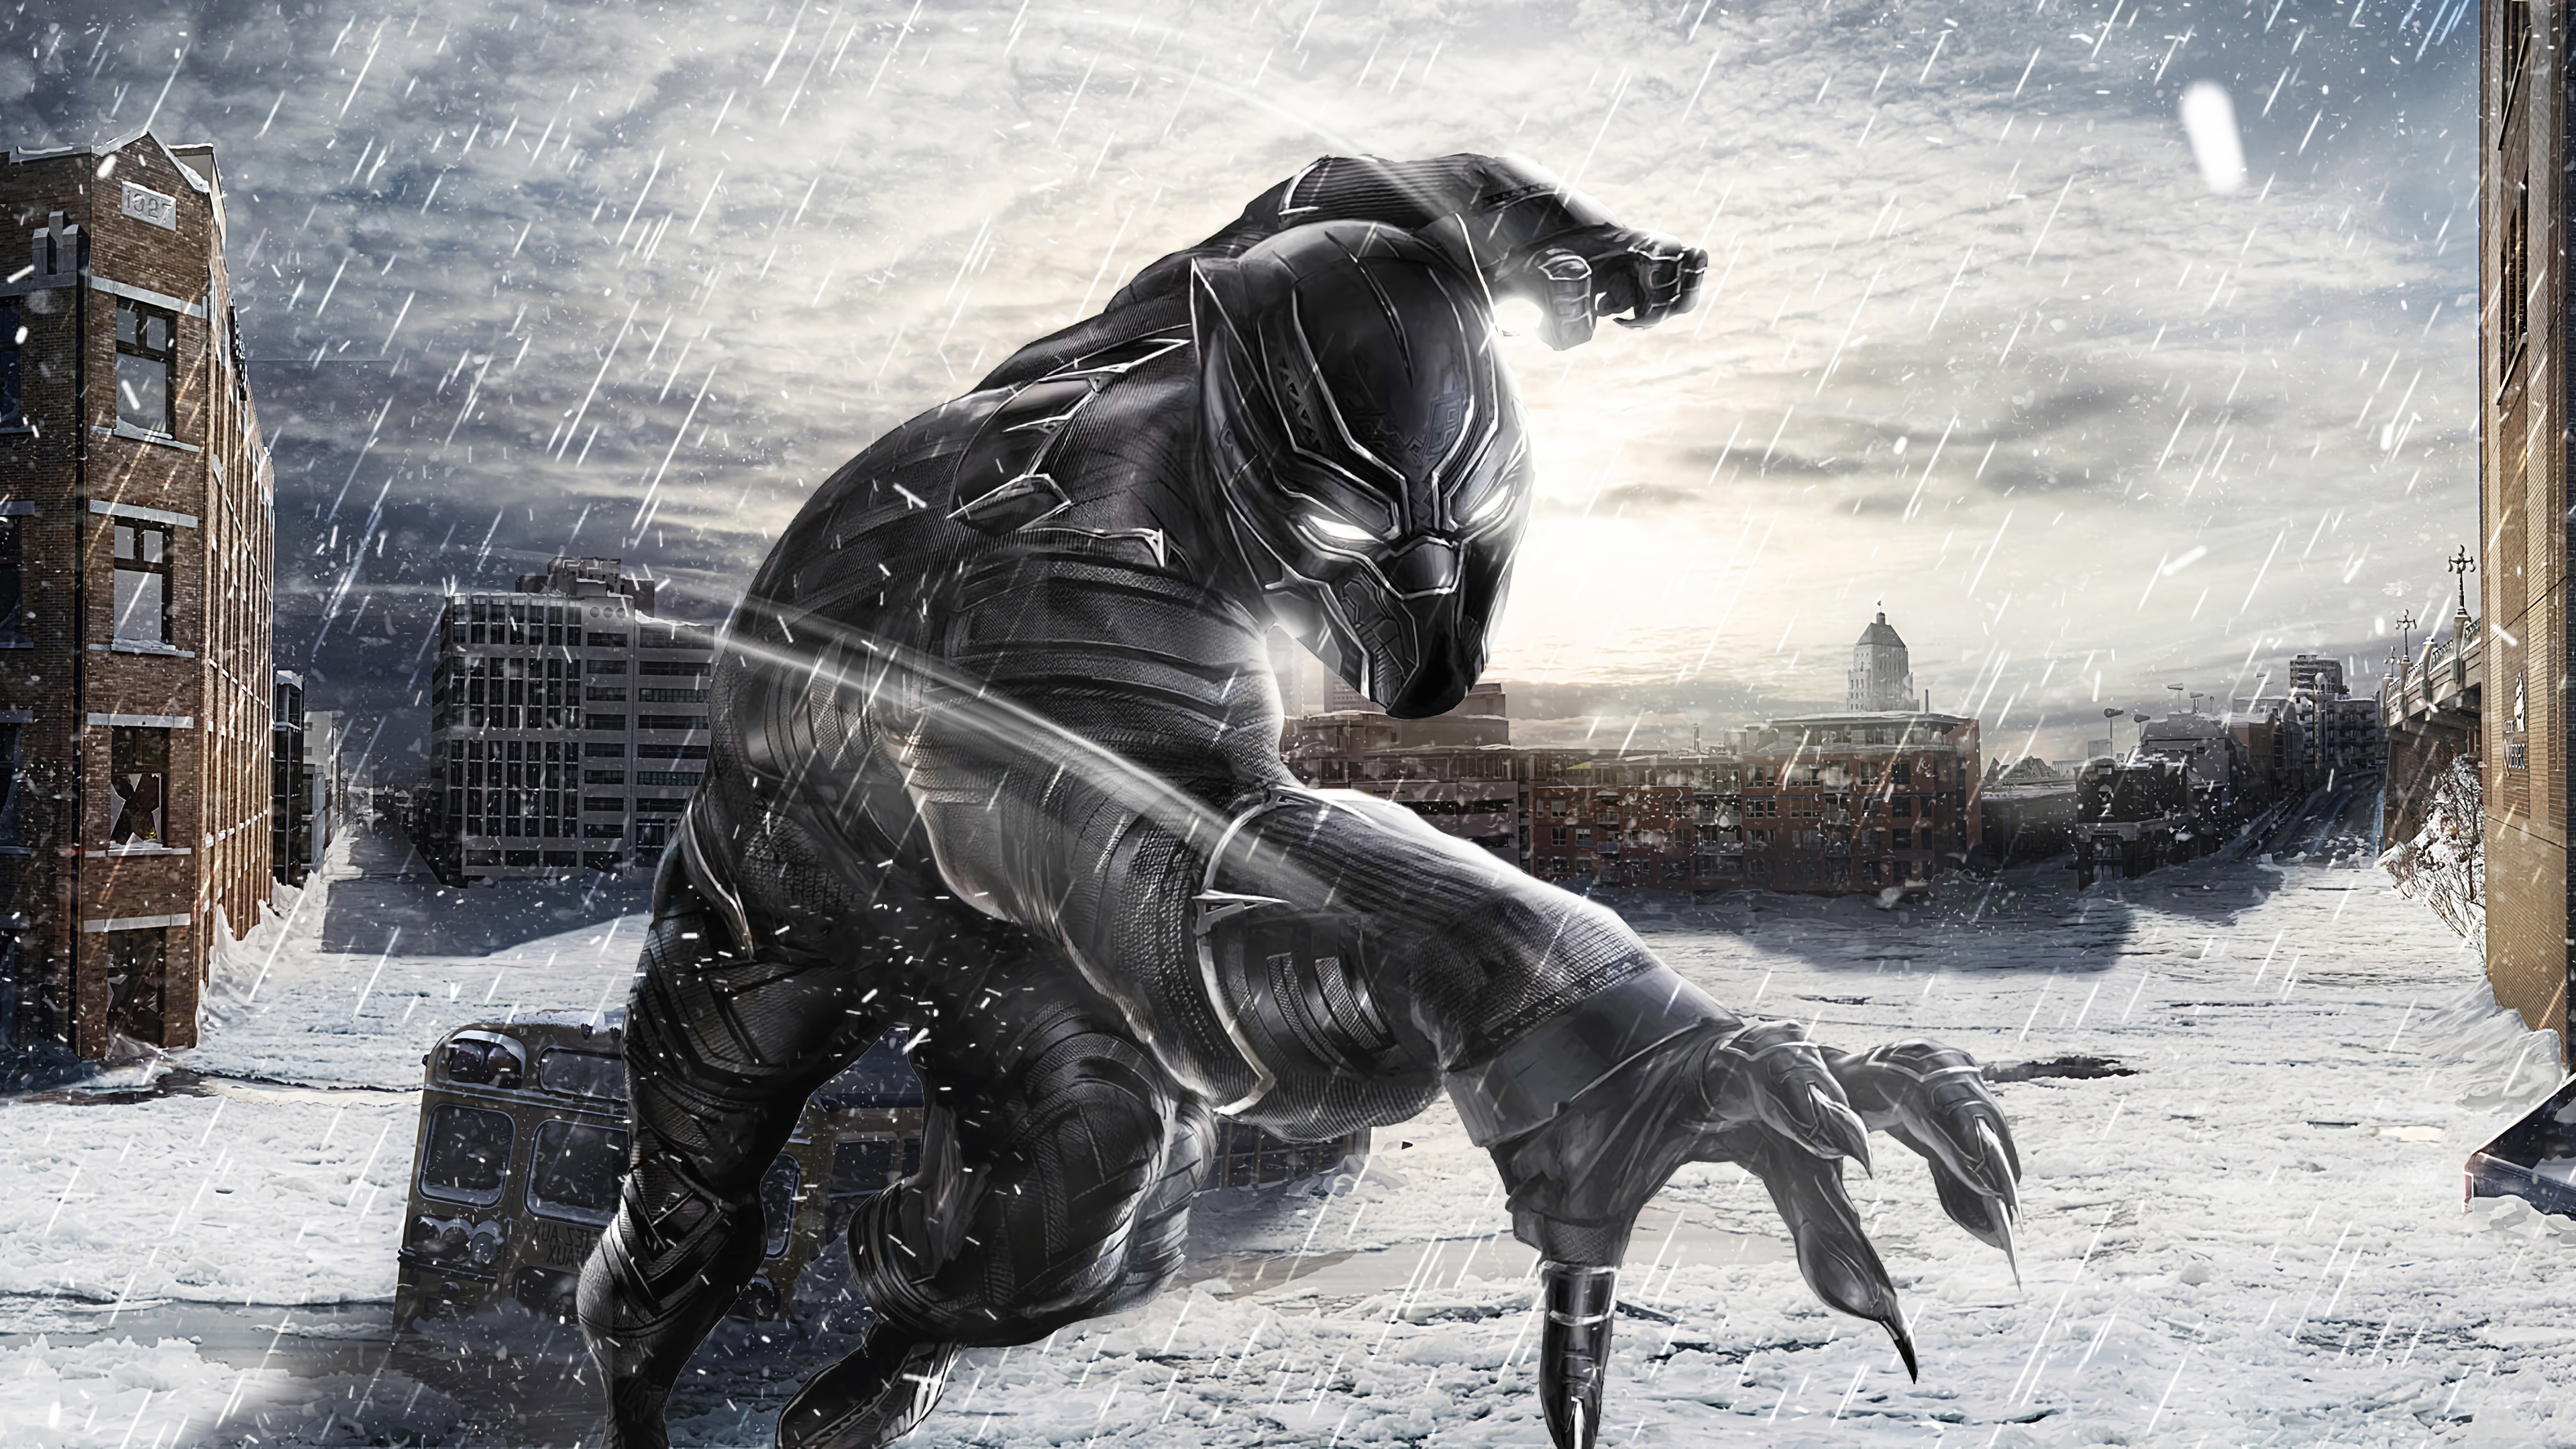 black panther in snow 1568055381 - Black Panther In Snow - superheroes wallpapers, hd-wallpapers, deviantart wallpapers, black panther wallpapers, artwork wallpapers, 4k-wallpapers